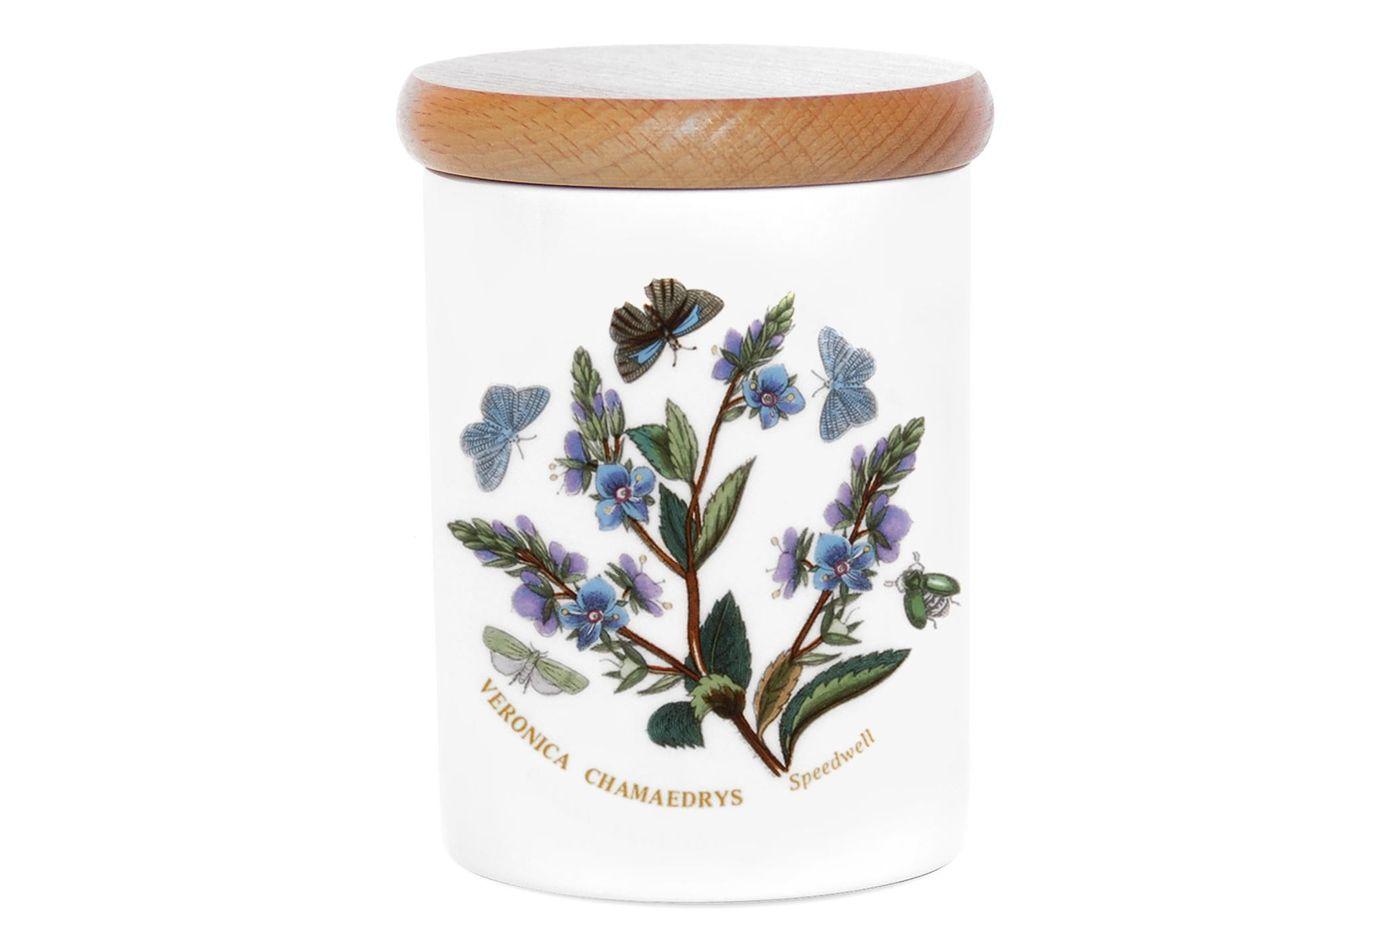 "Portmeirion Botanic Garden Storage Jar + Lid Speedwell 3 1/4 x 4"" thumb 1"